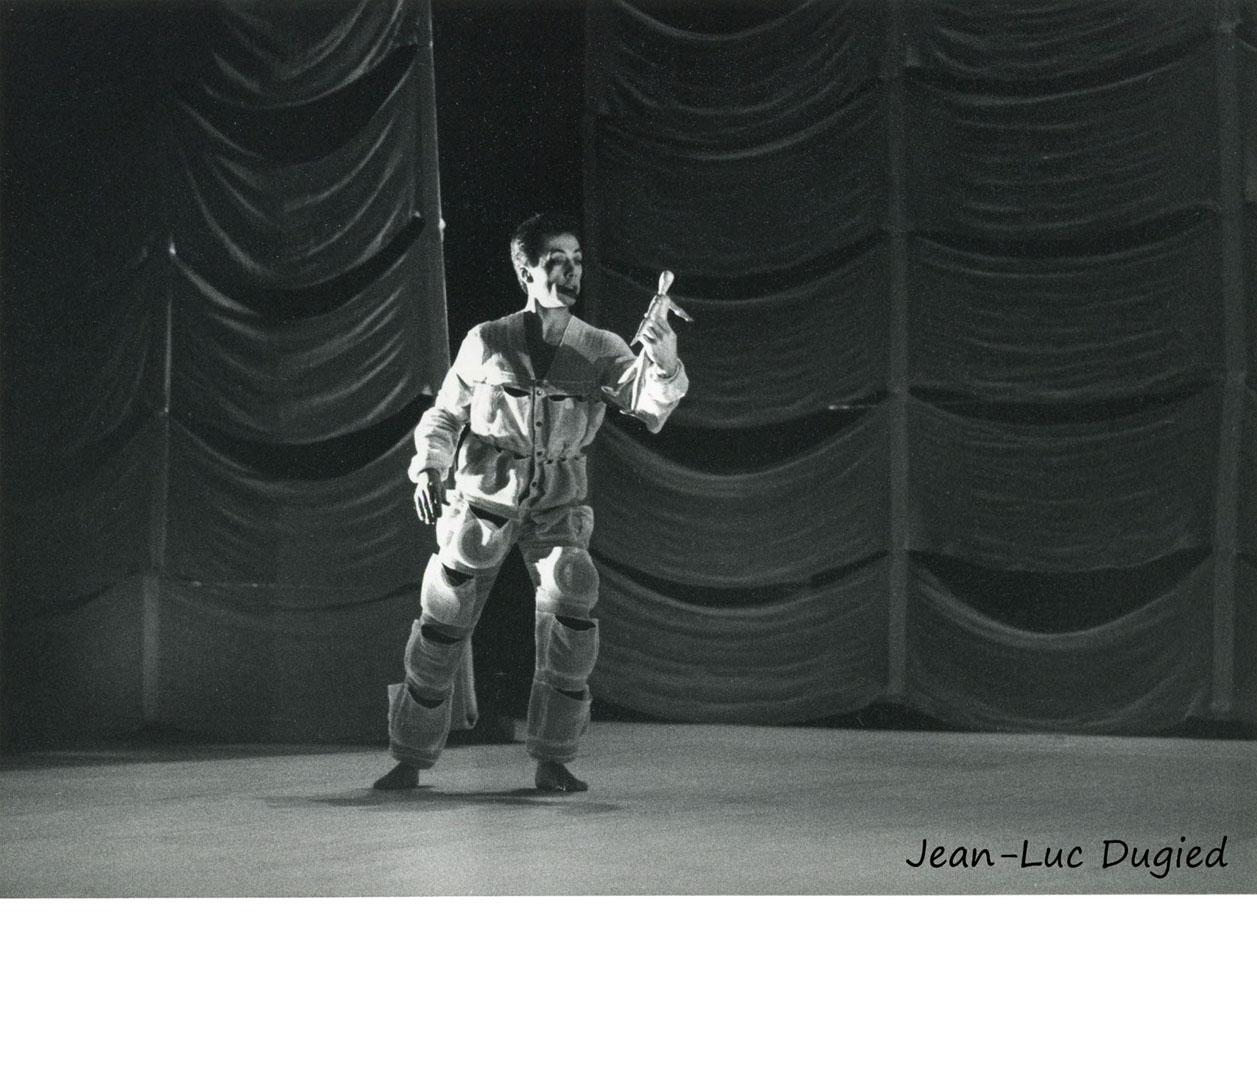 39 Witzman-Anaya Alejandro - Georges et les rêves - 1984